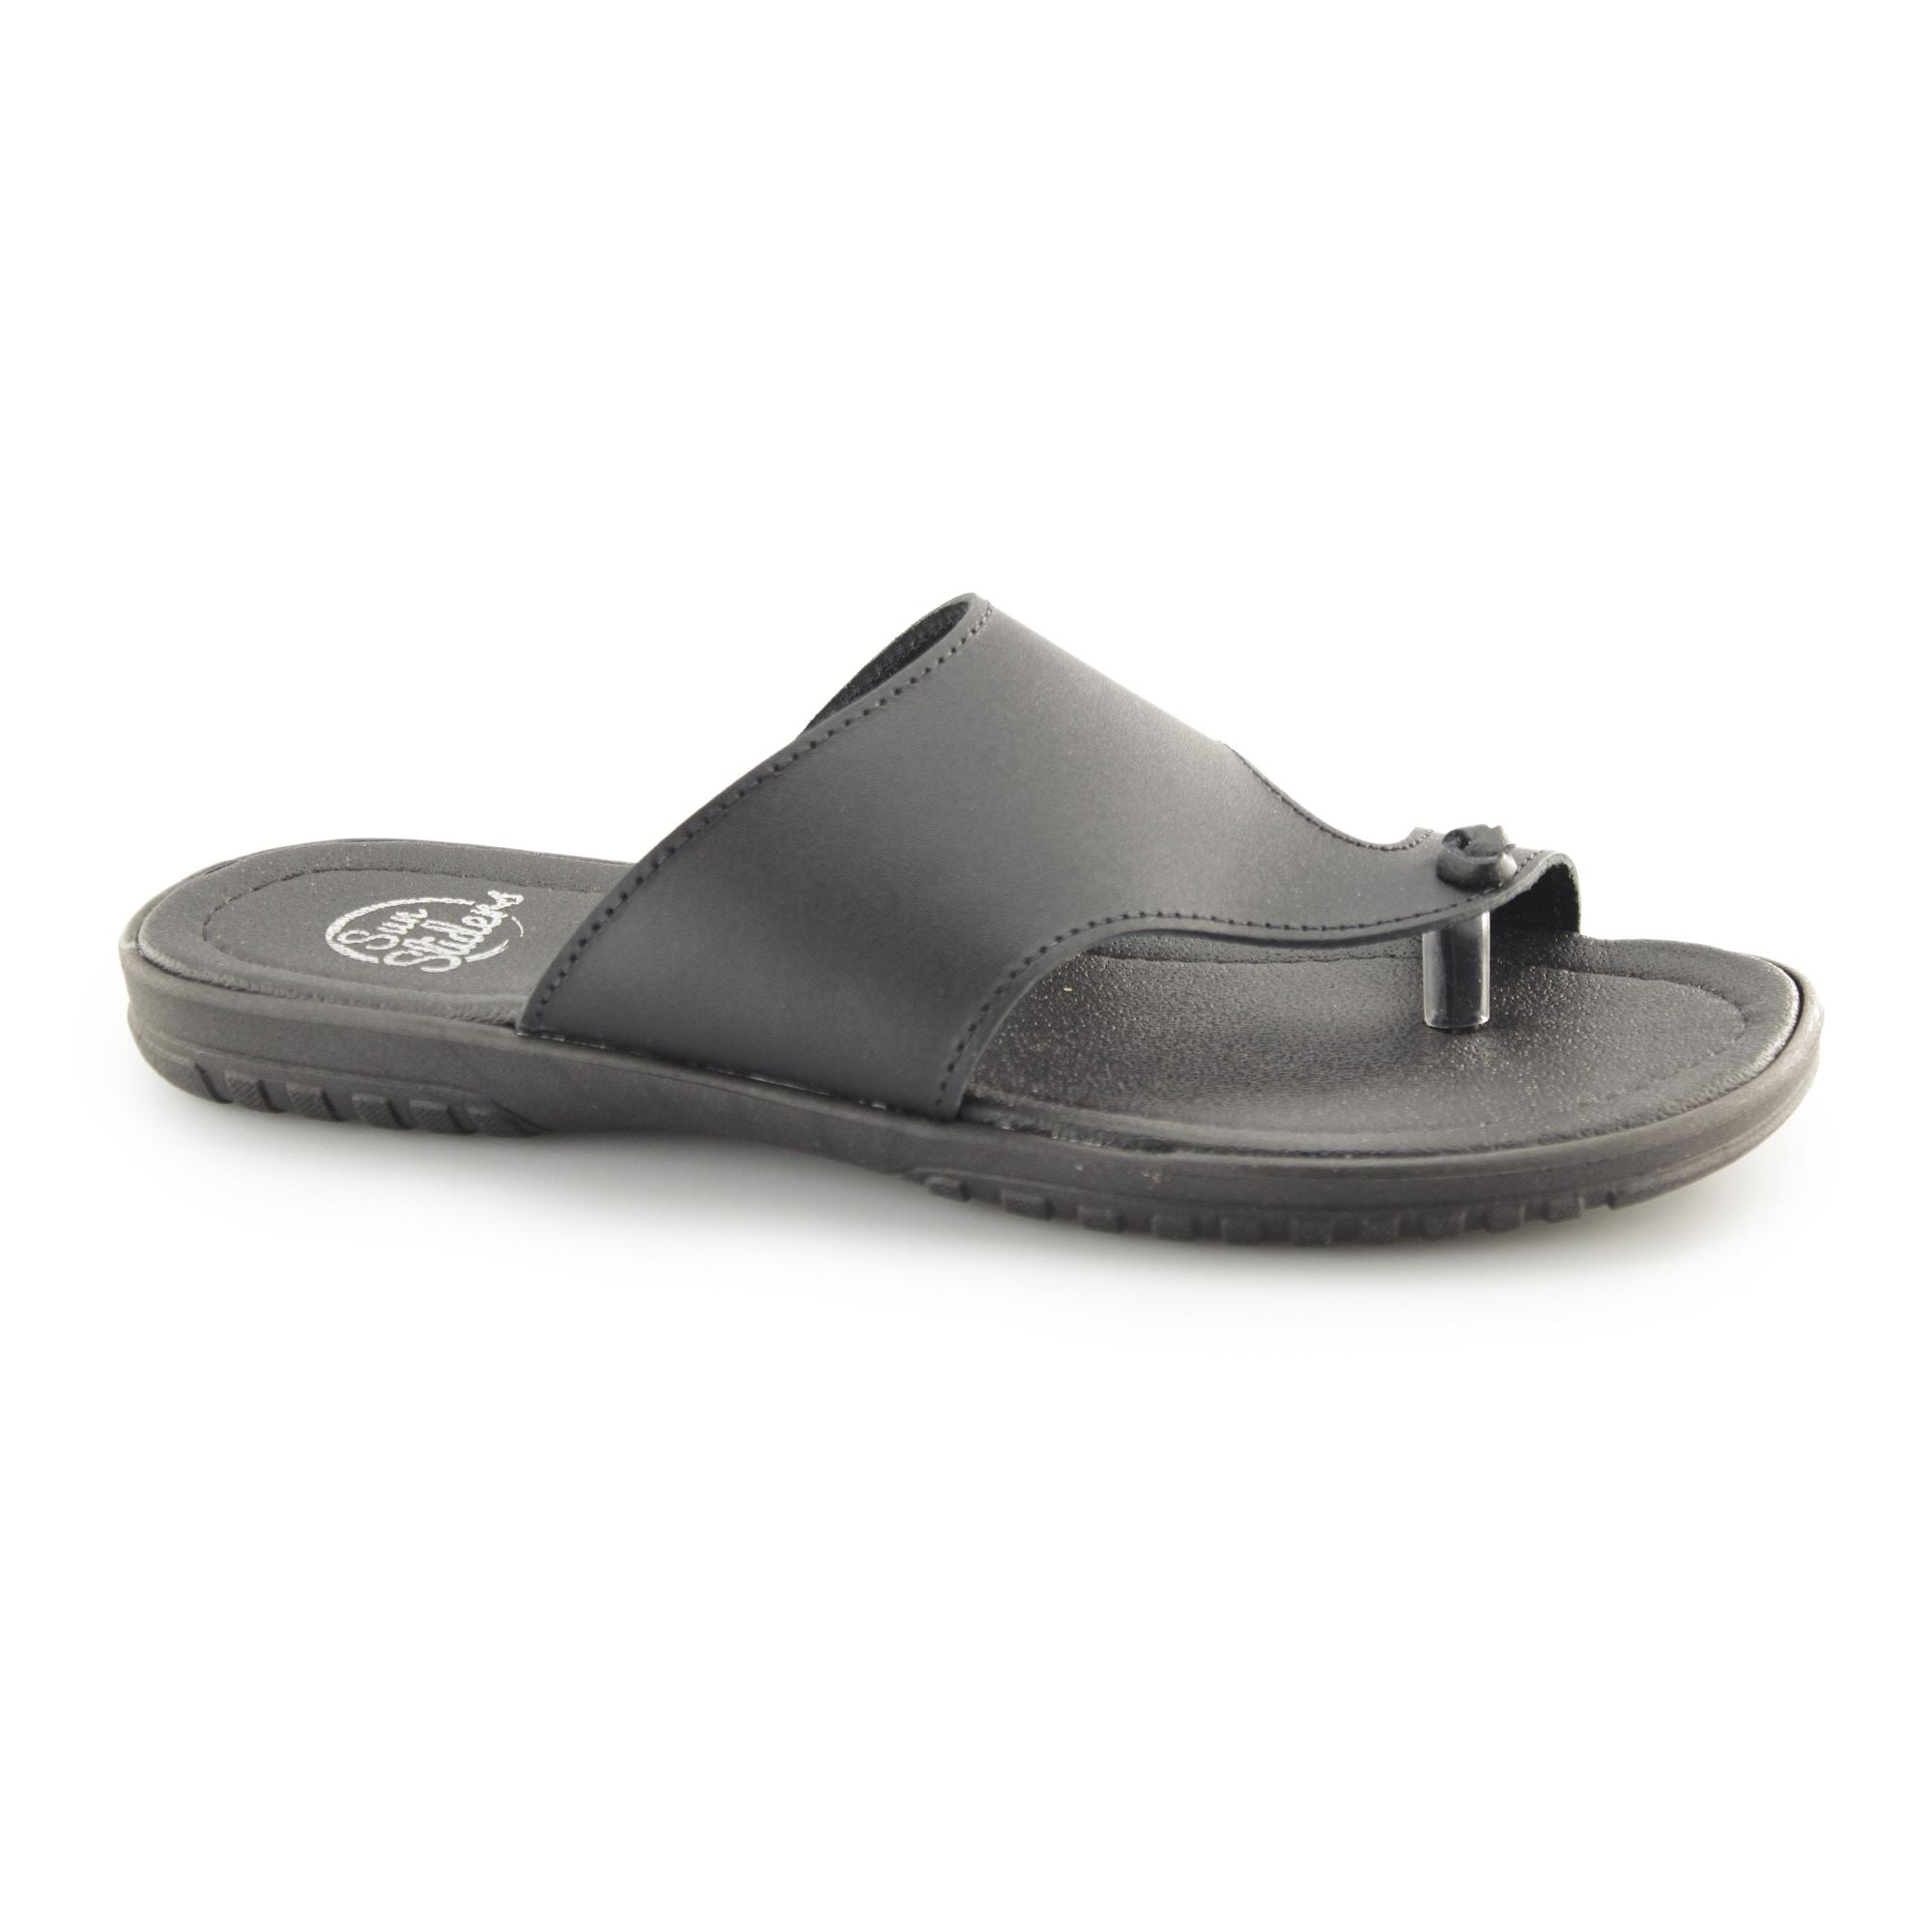 255b105bc70e Sun Sliders SAVIO Mens Leather Toe Post Mule Sandals Black